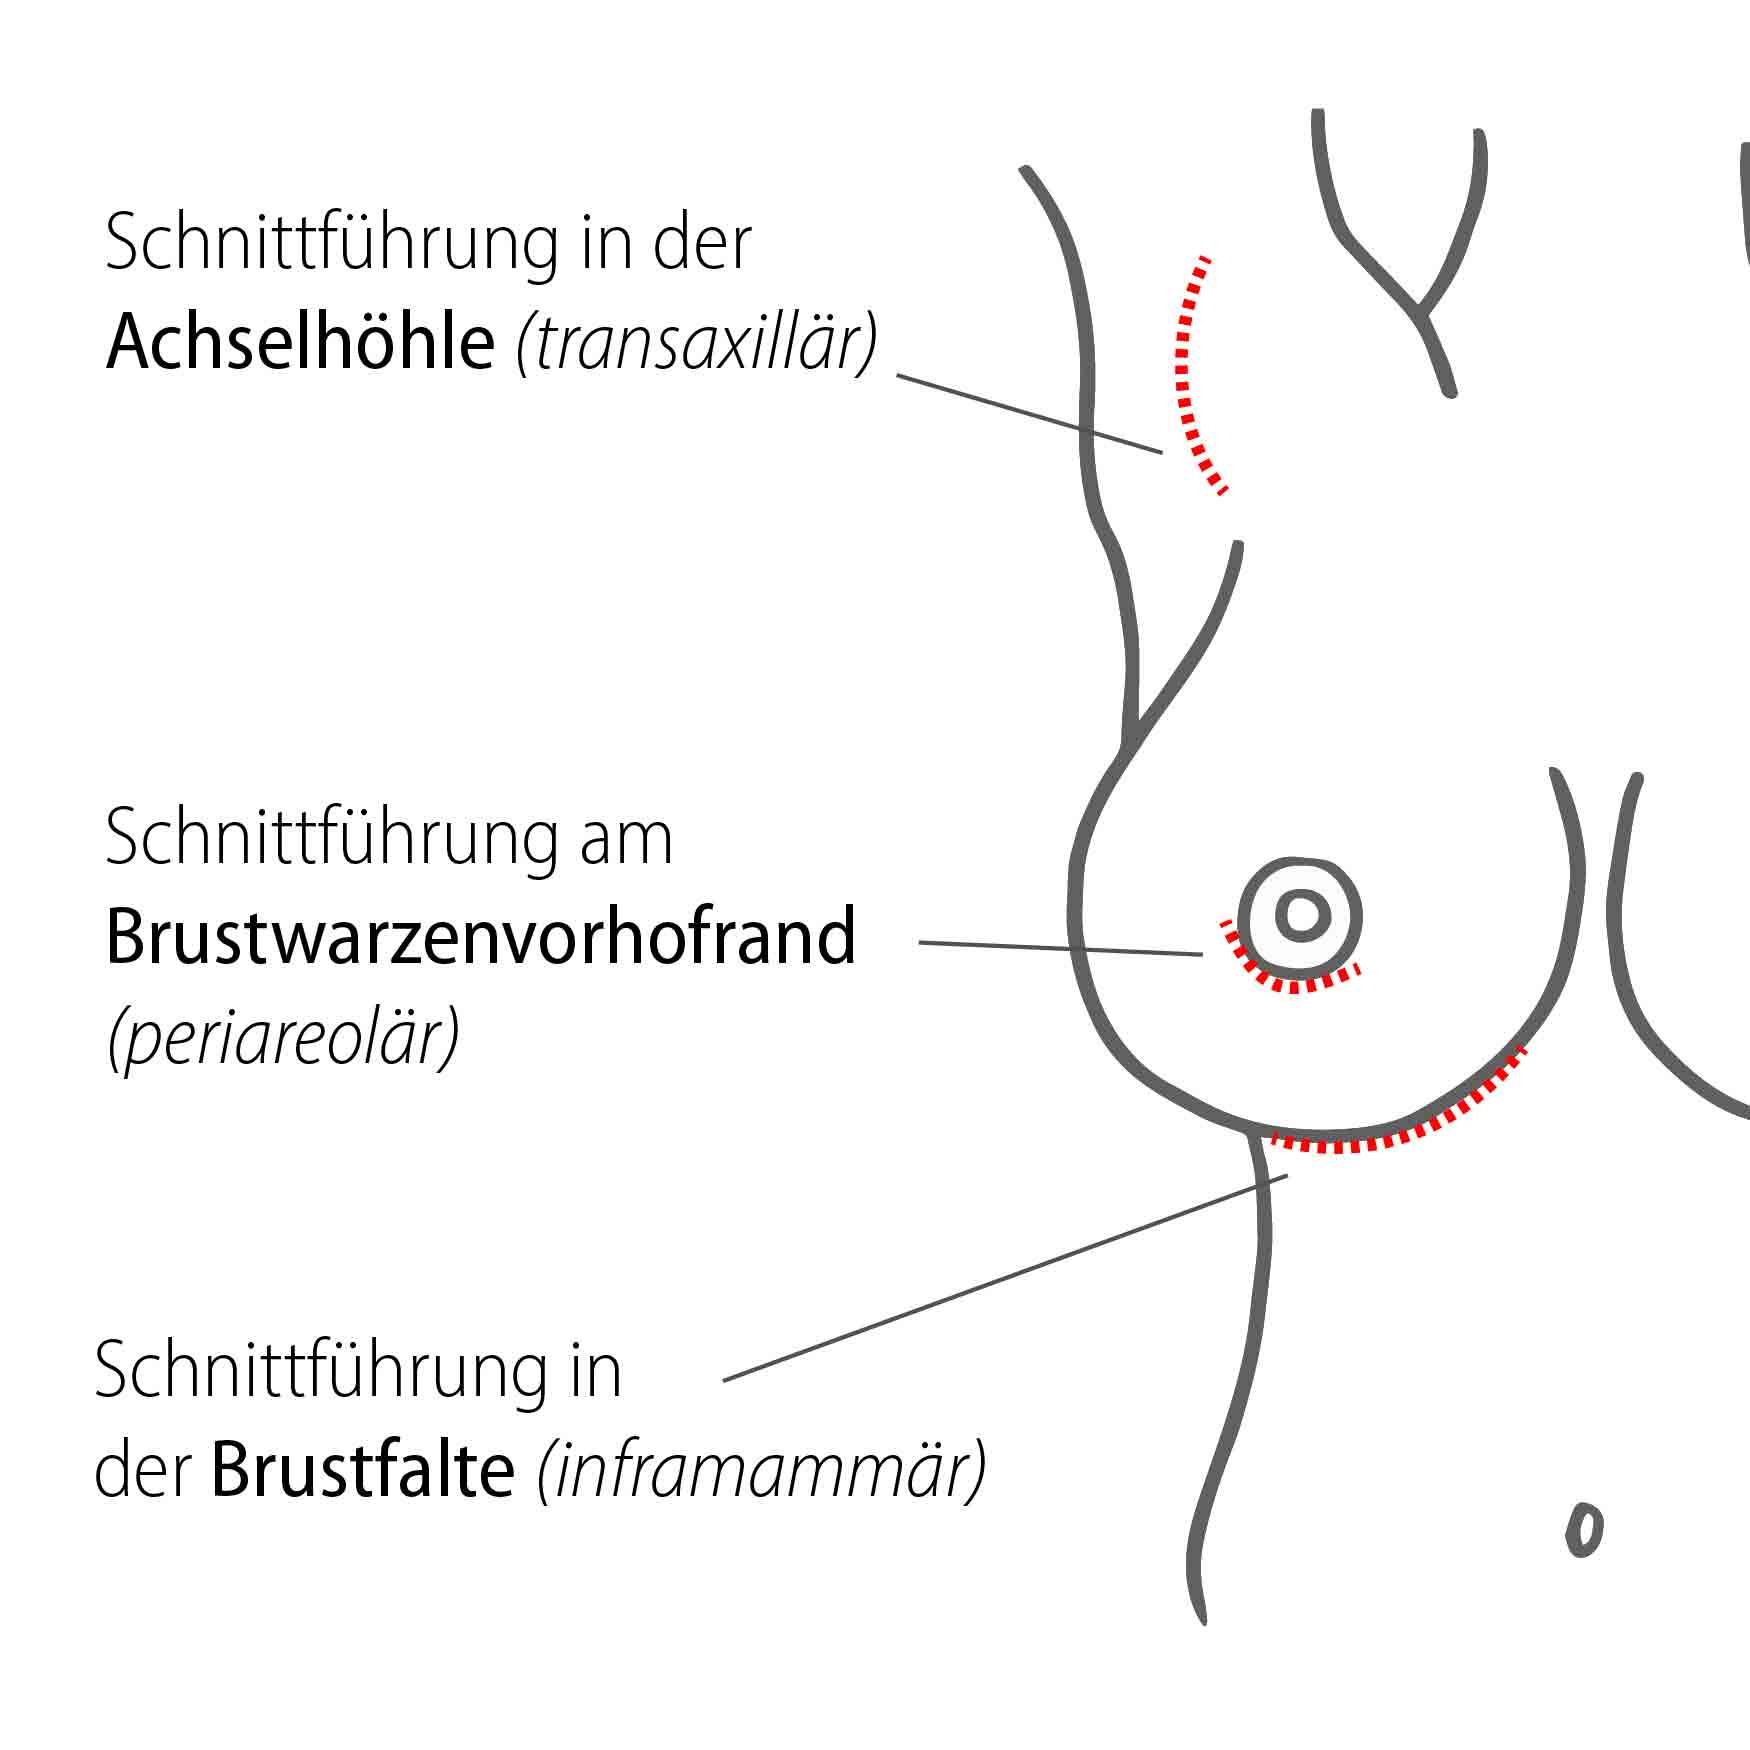 brustvergroesserung schnitte transaxillaer periareolaer inframammaer 01